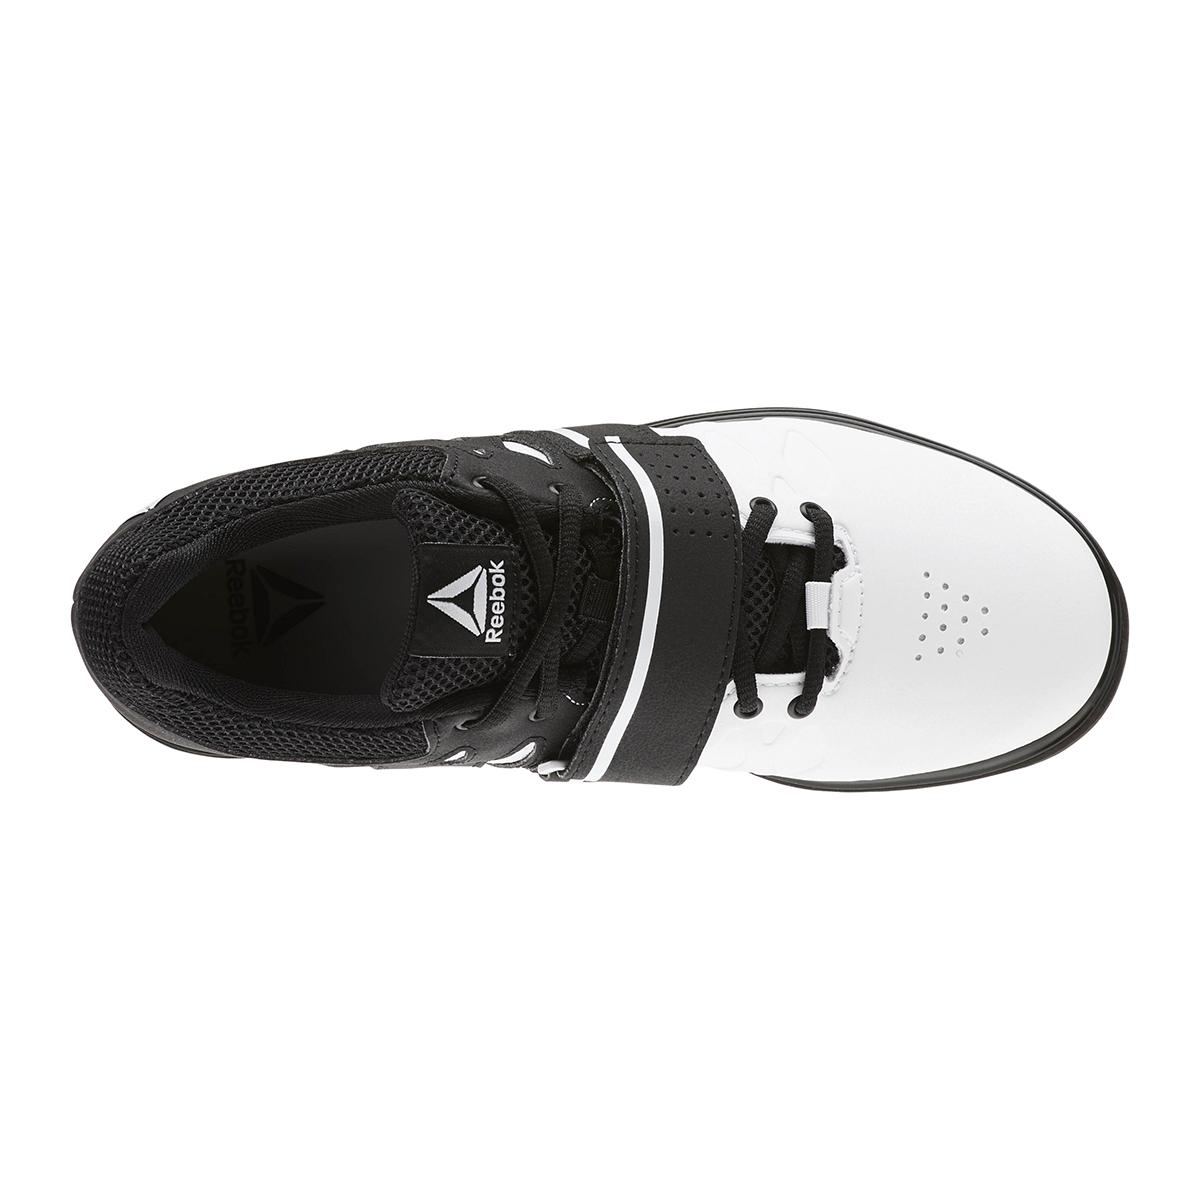 Reebok Lifter PR Training Shoes - Color: White/Black (Regular Width) - Size: 6.5, White/Black, large, image 3